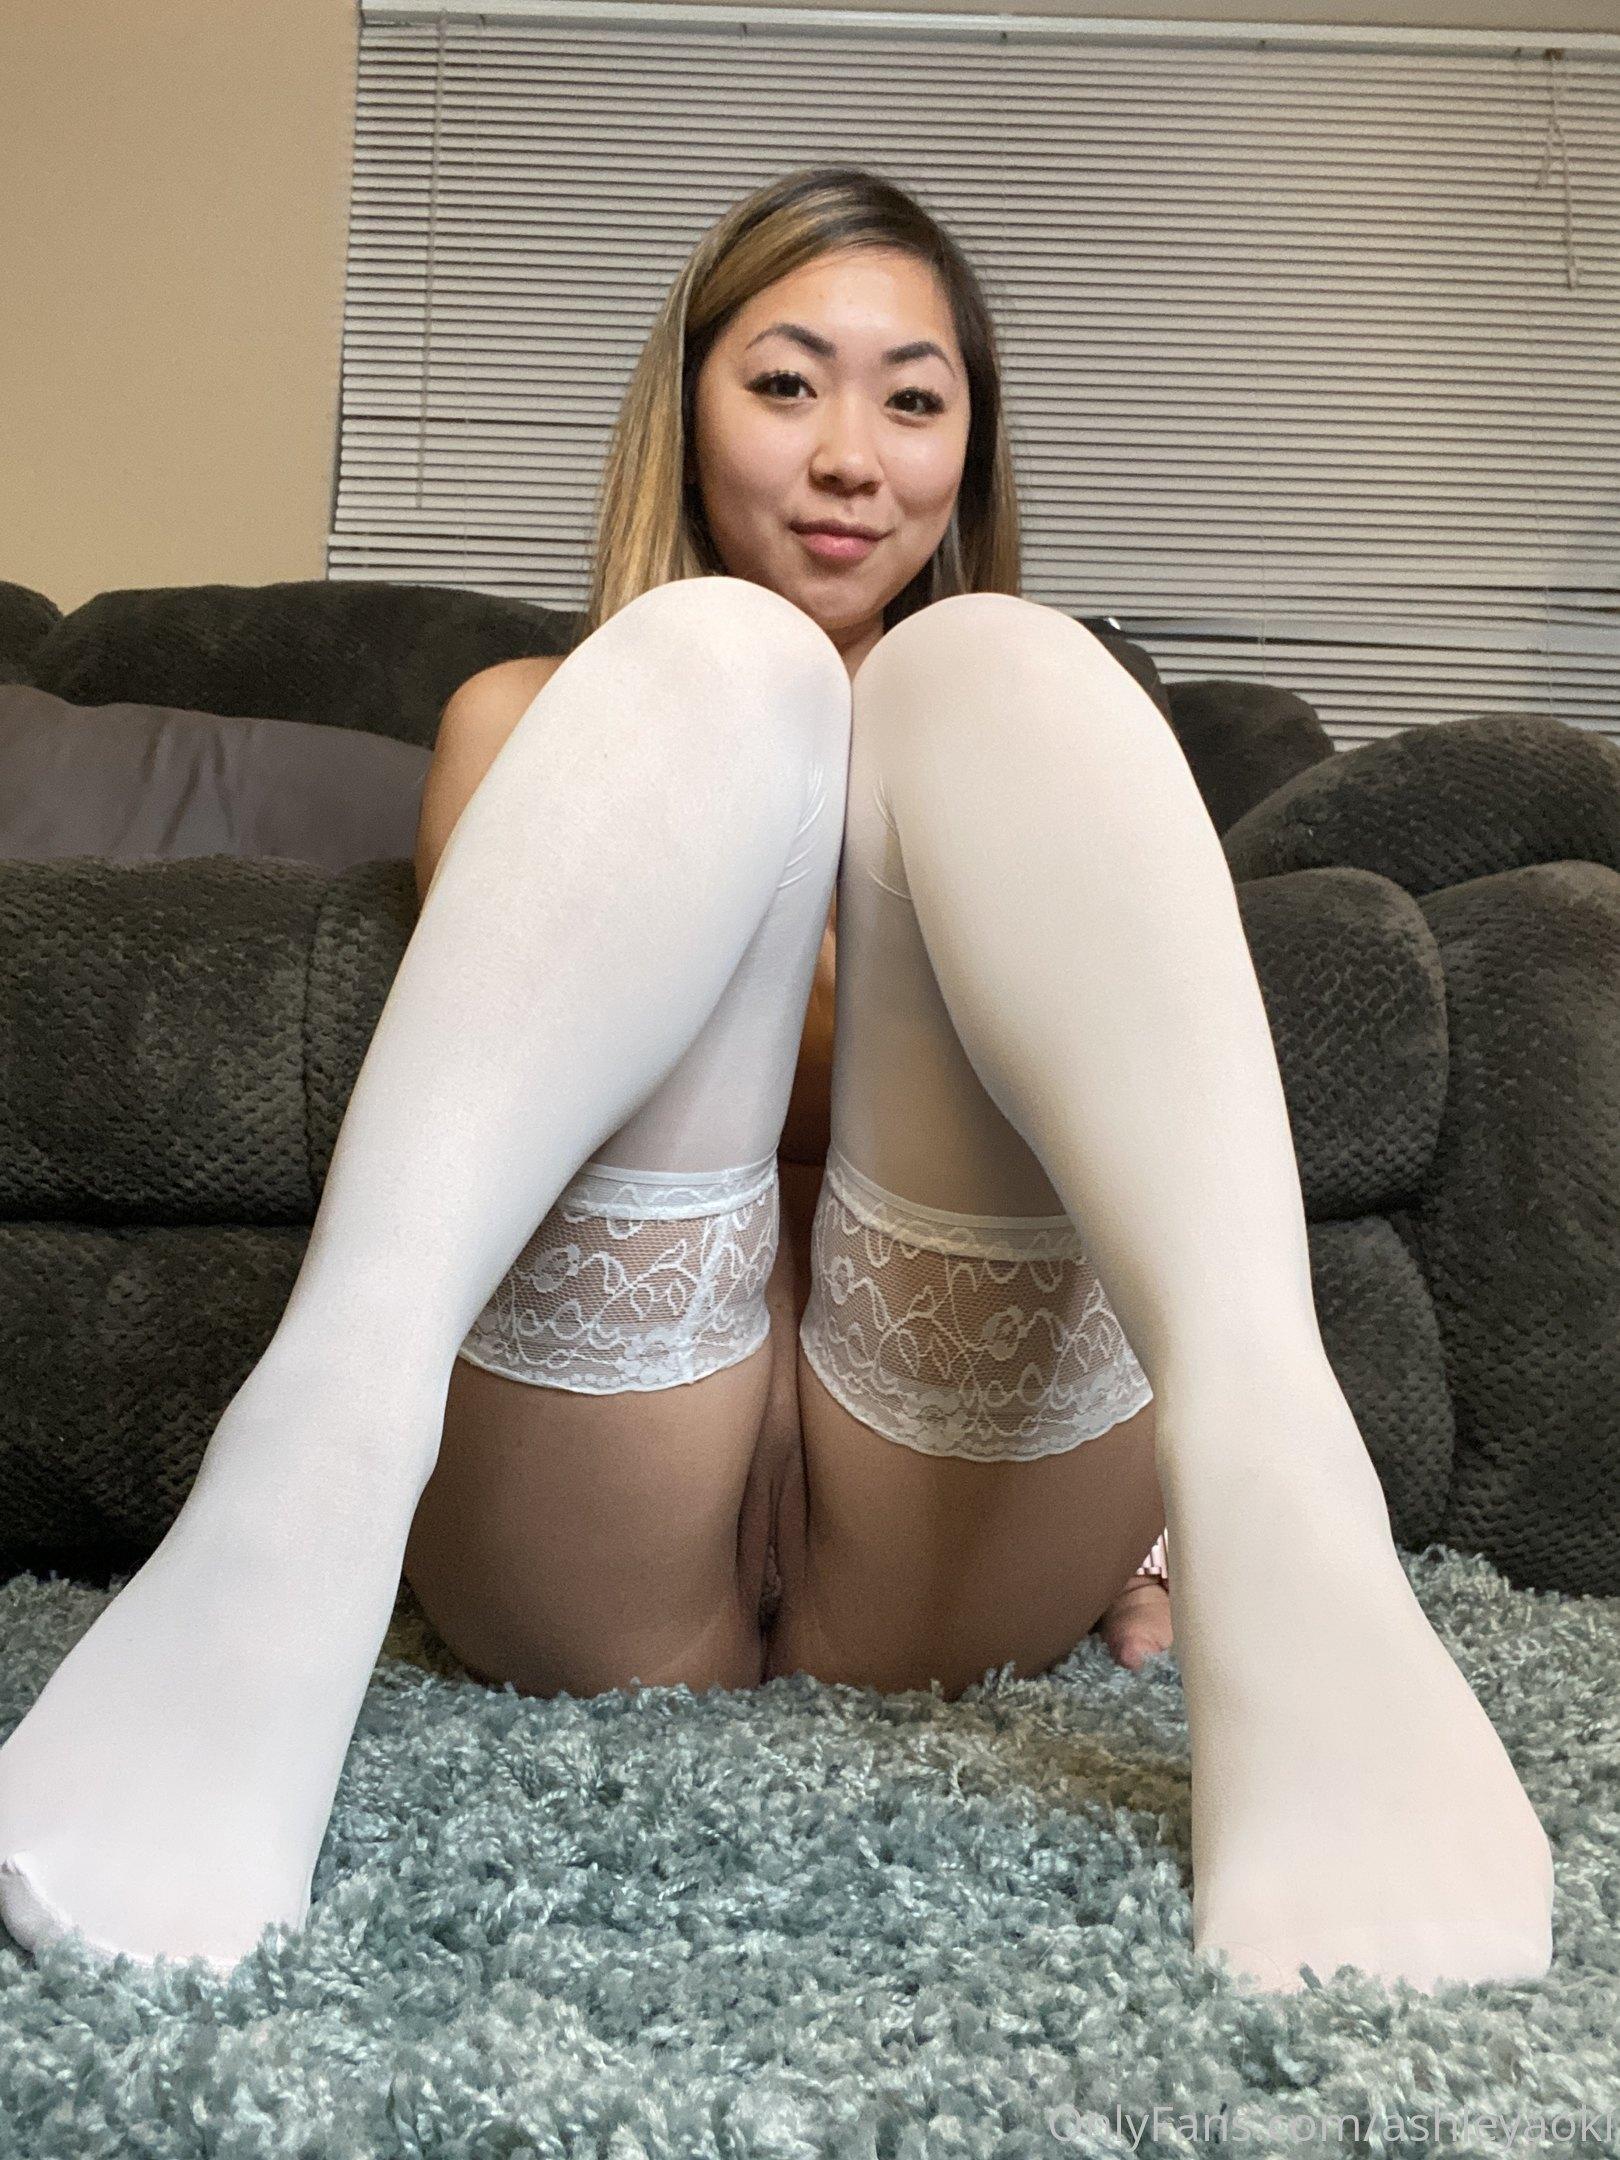 Ashley Aoki, Ashleyaoki, Onlyfans Leaks 0152